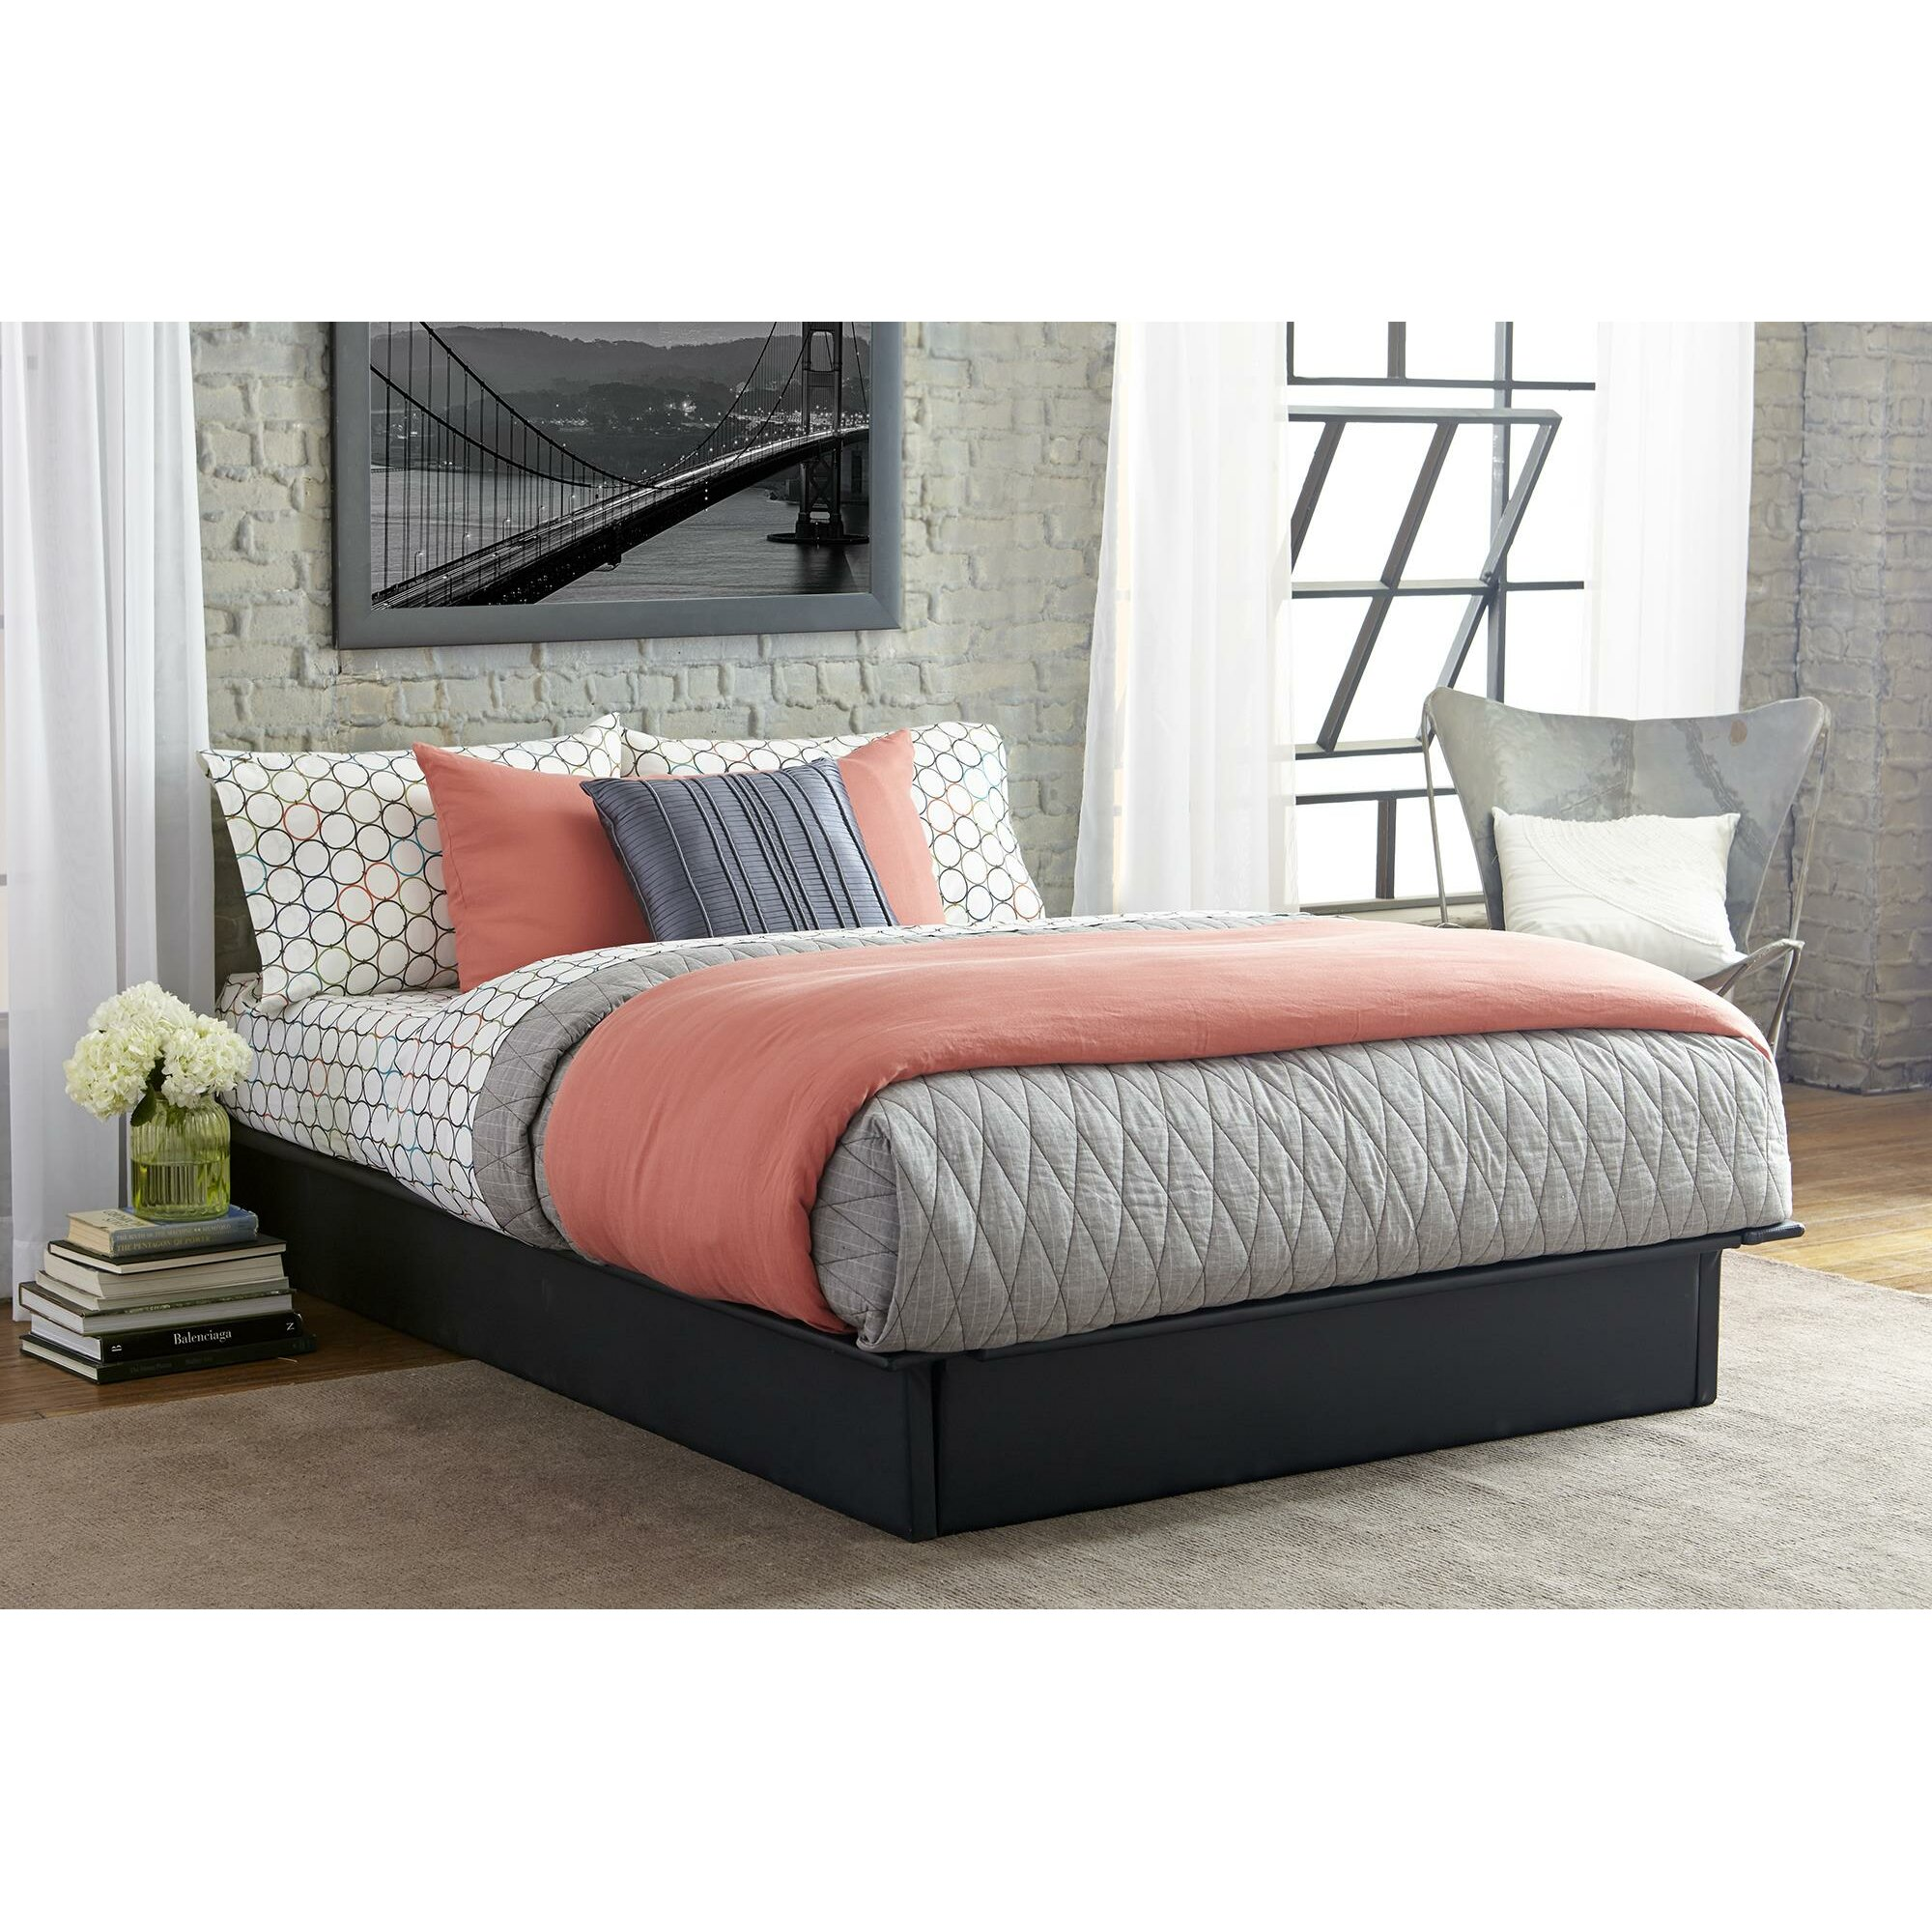 Dhp Upholstered Platform Bed Reviews Wayfair